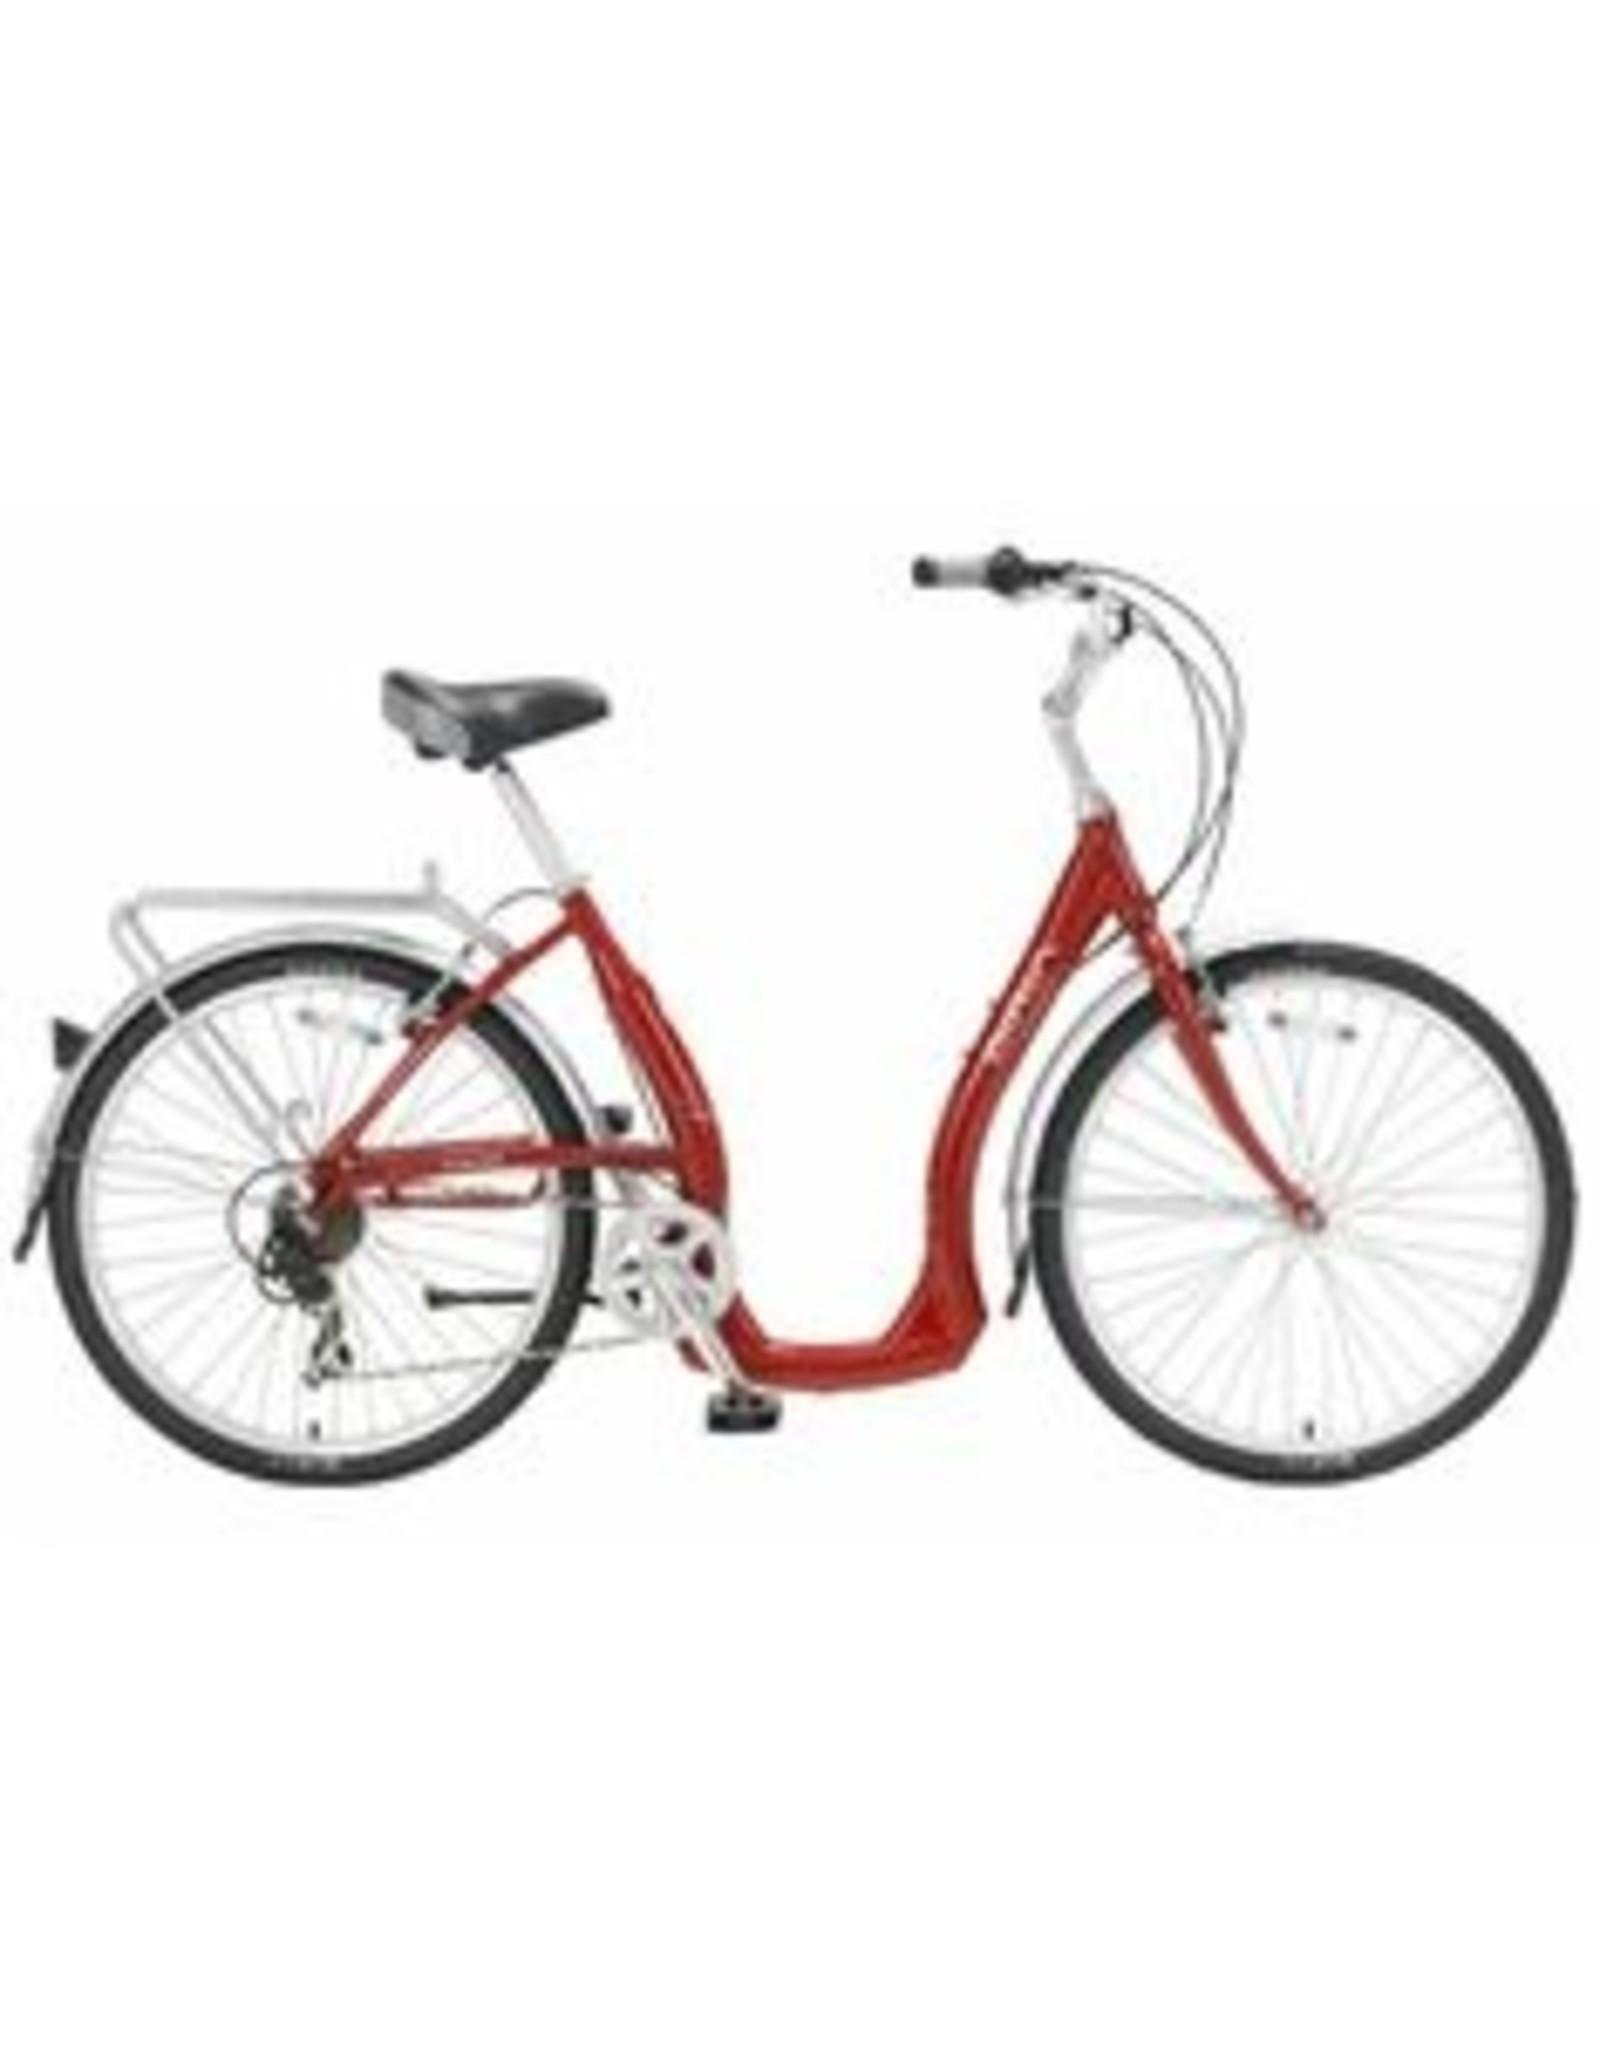 Biria Bikes Easy boarding Easy 7, 7 speed Derailleur, 18, Red